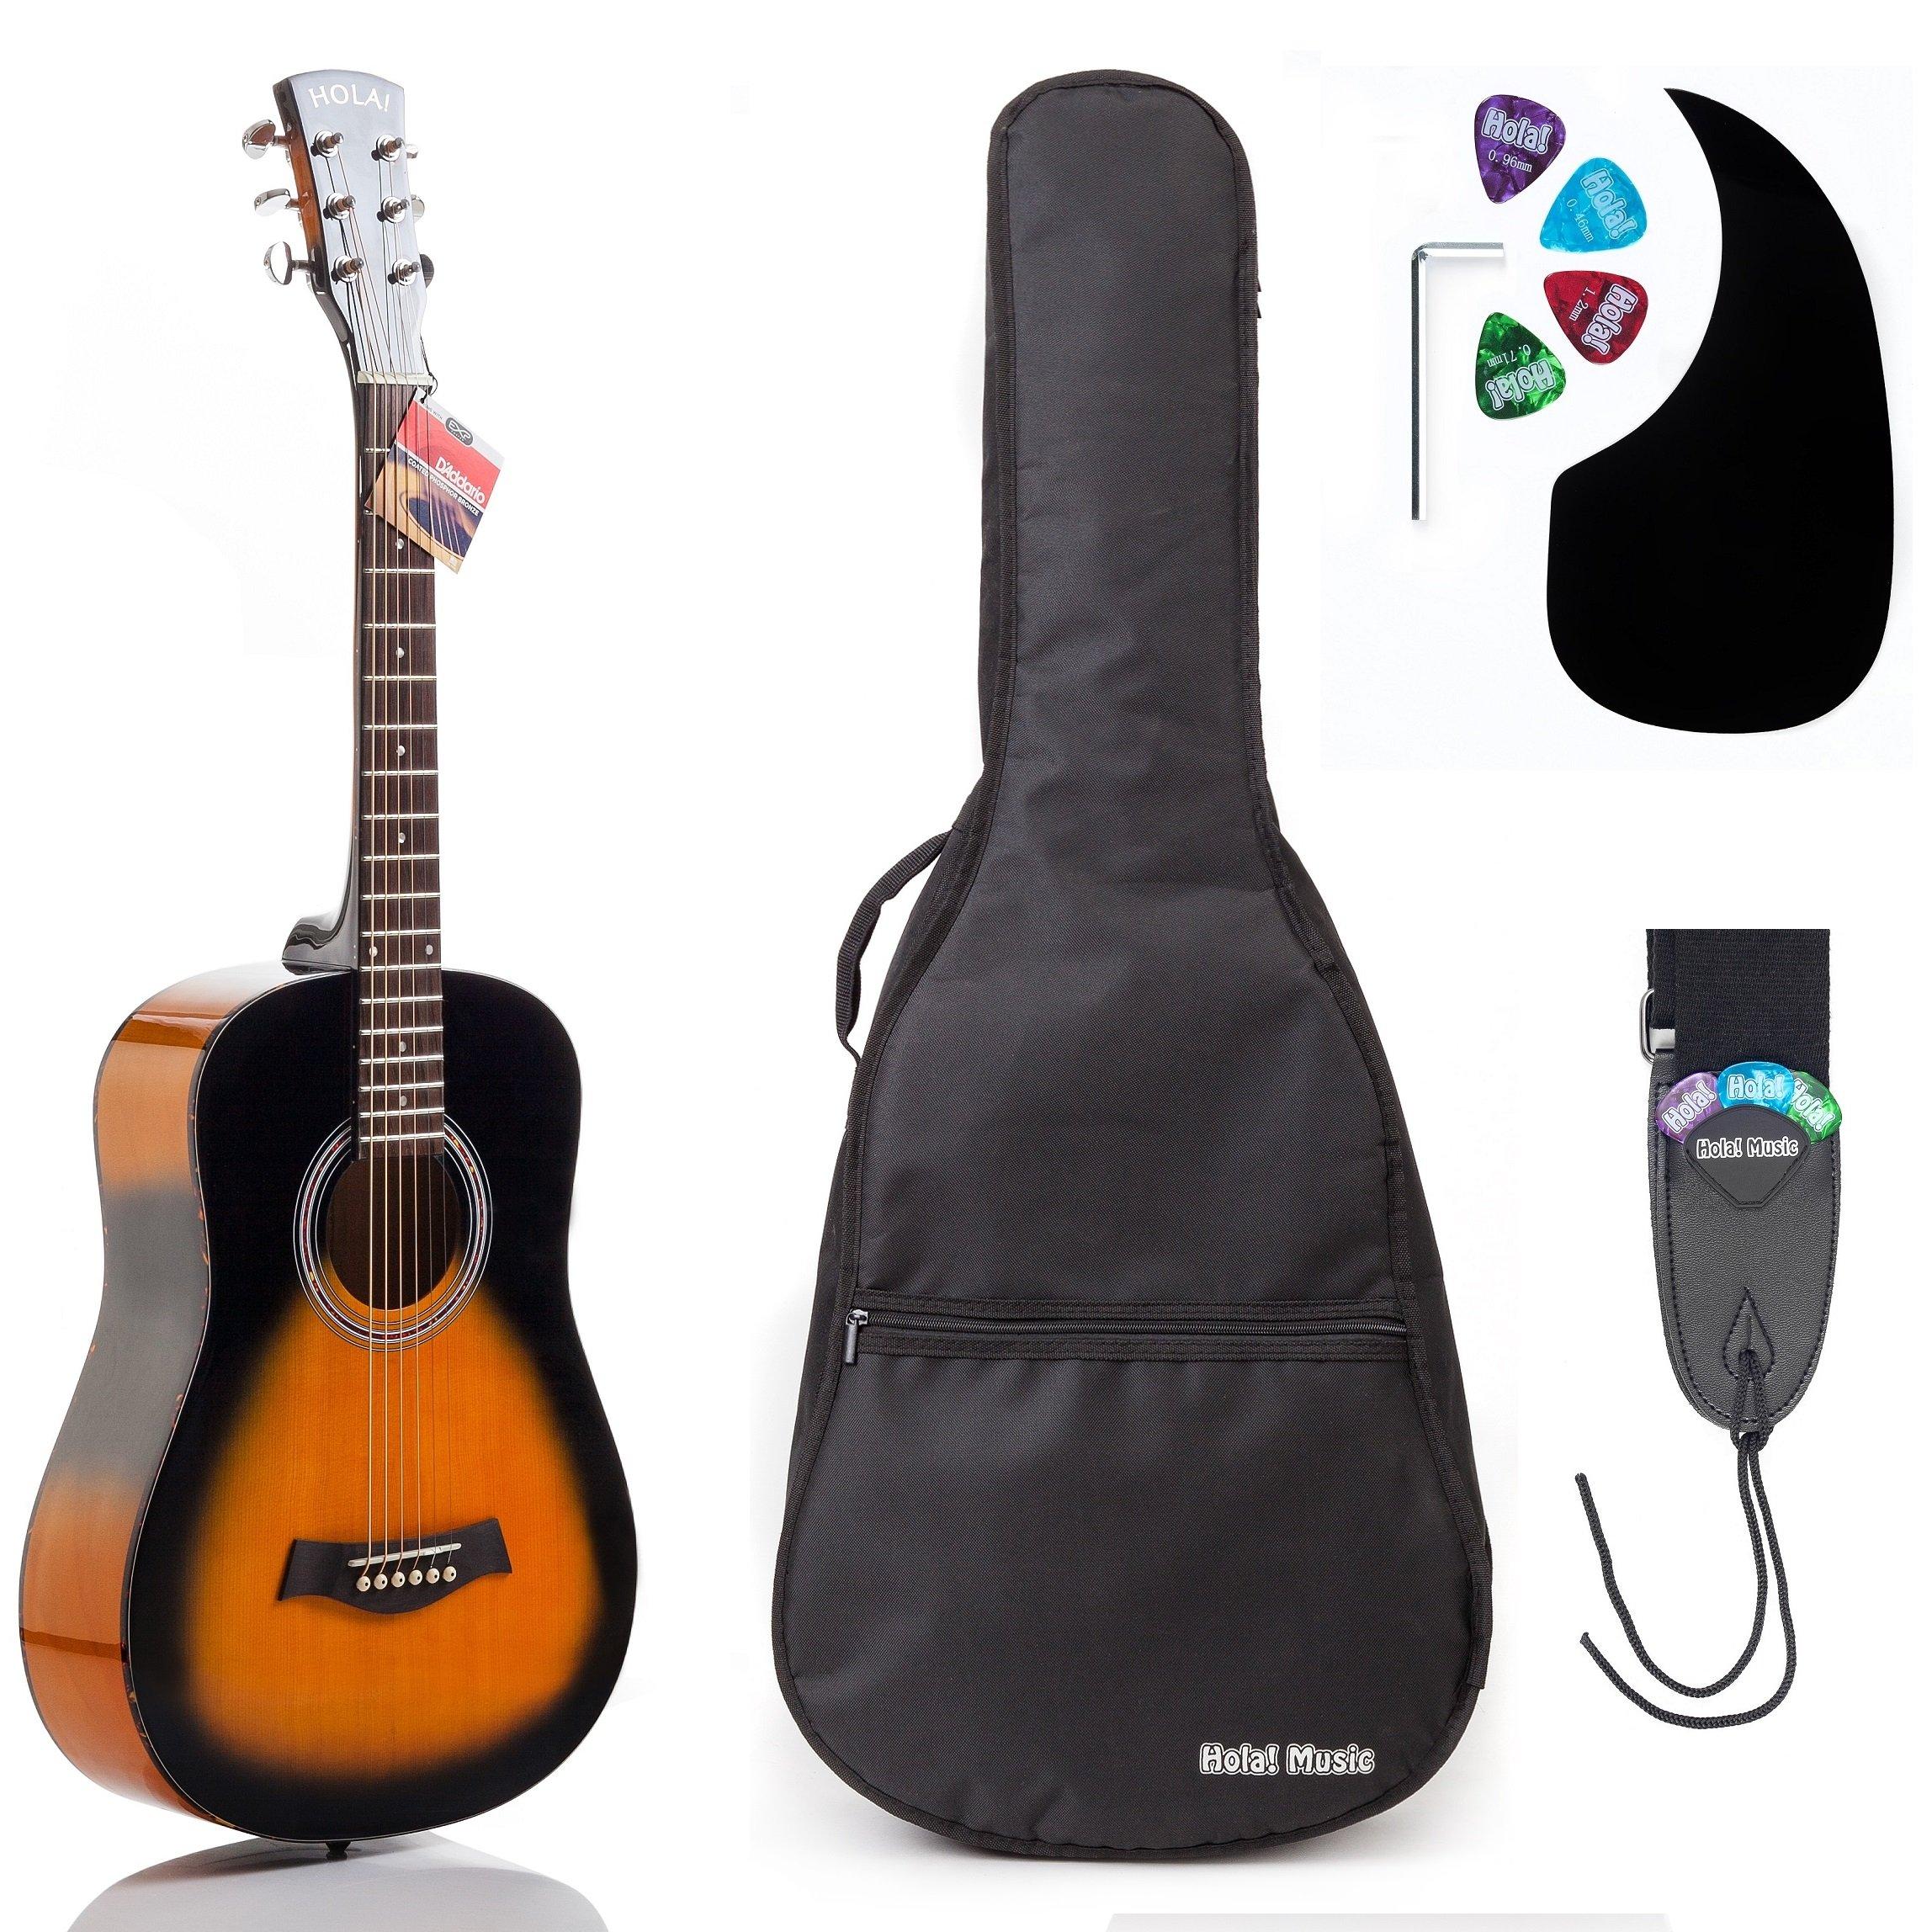 Acoustic Guitar Bundle Junior (Travel) Series by Hola! Music with D'Addario EXP16 Steel Strings, Padded Gig Bag, Guitar Strap and Picks, 3/4 Size 36 Inch (Model HG-36SB), Vintage Sunburst